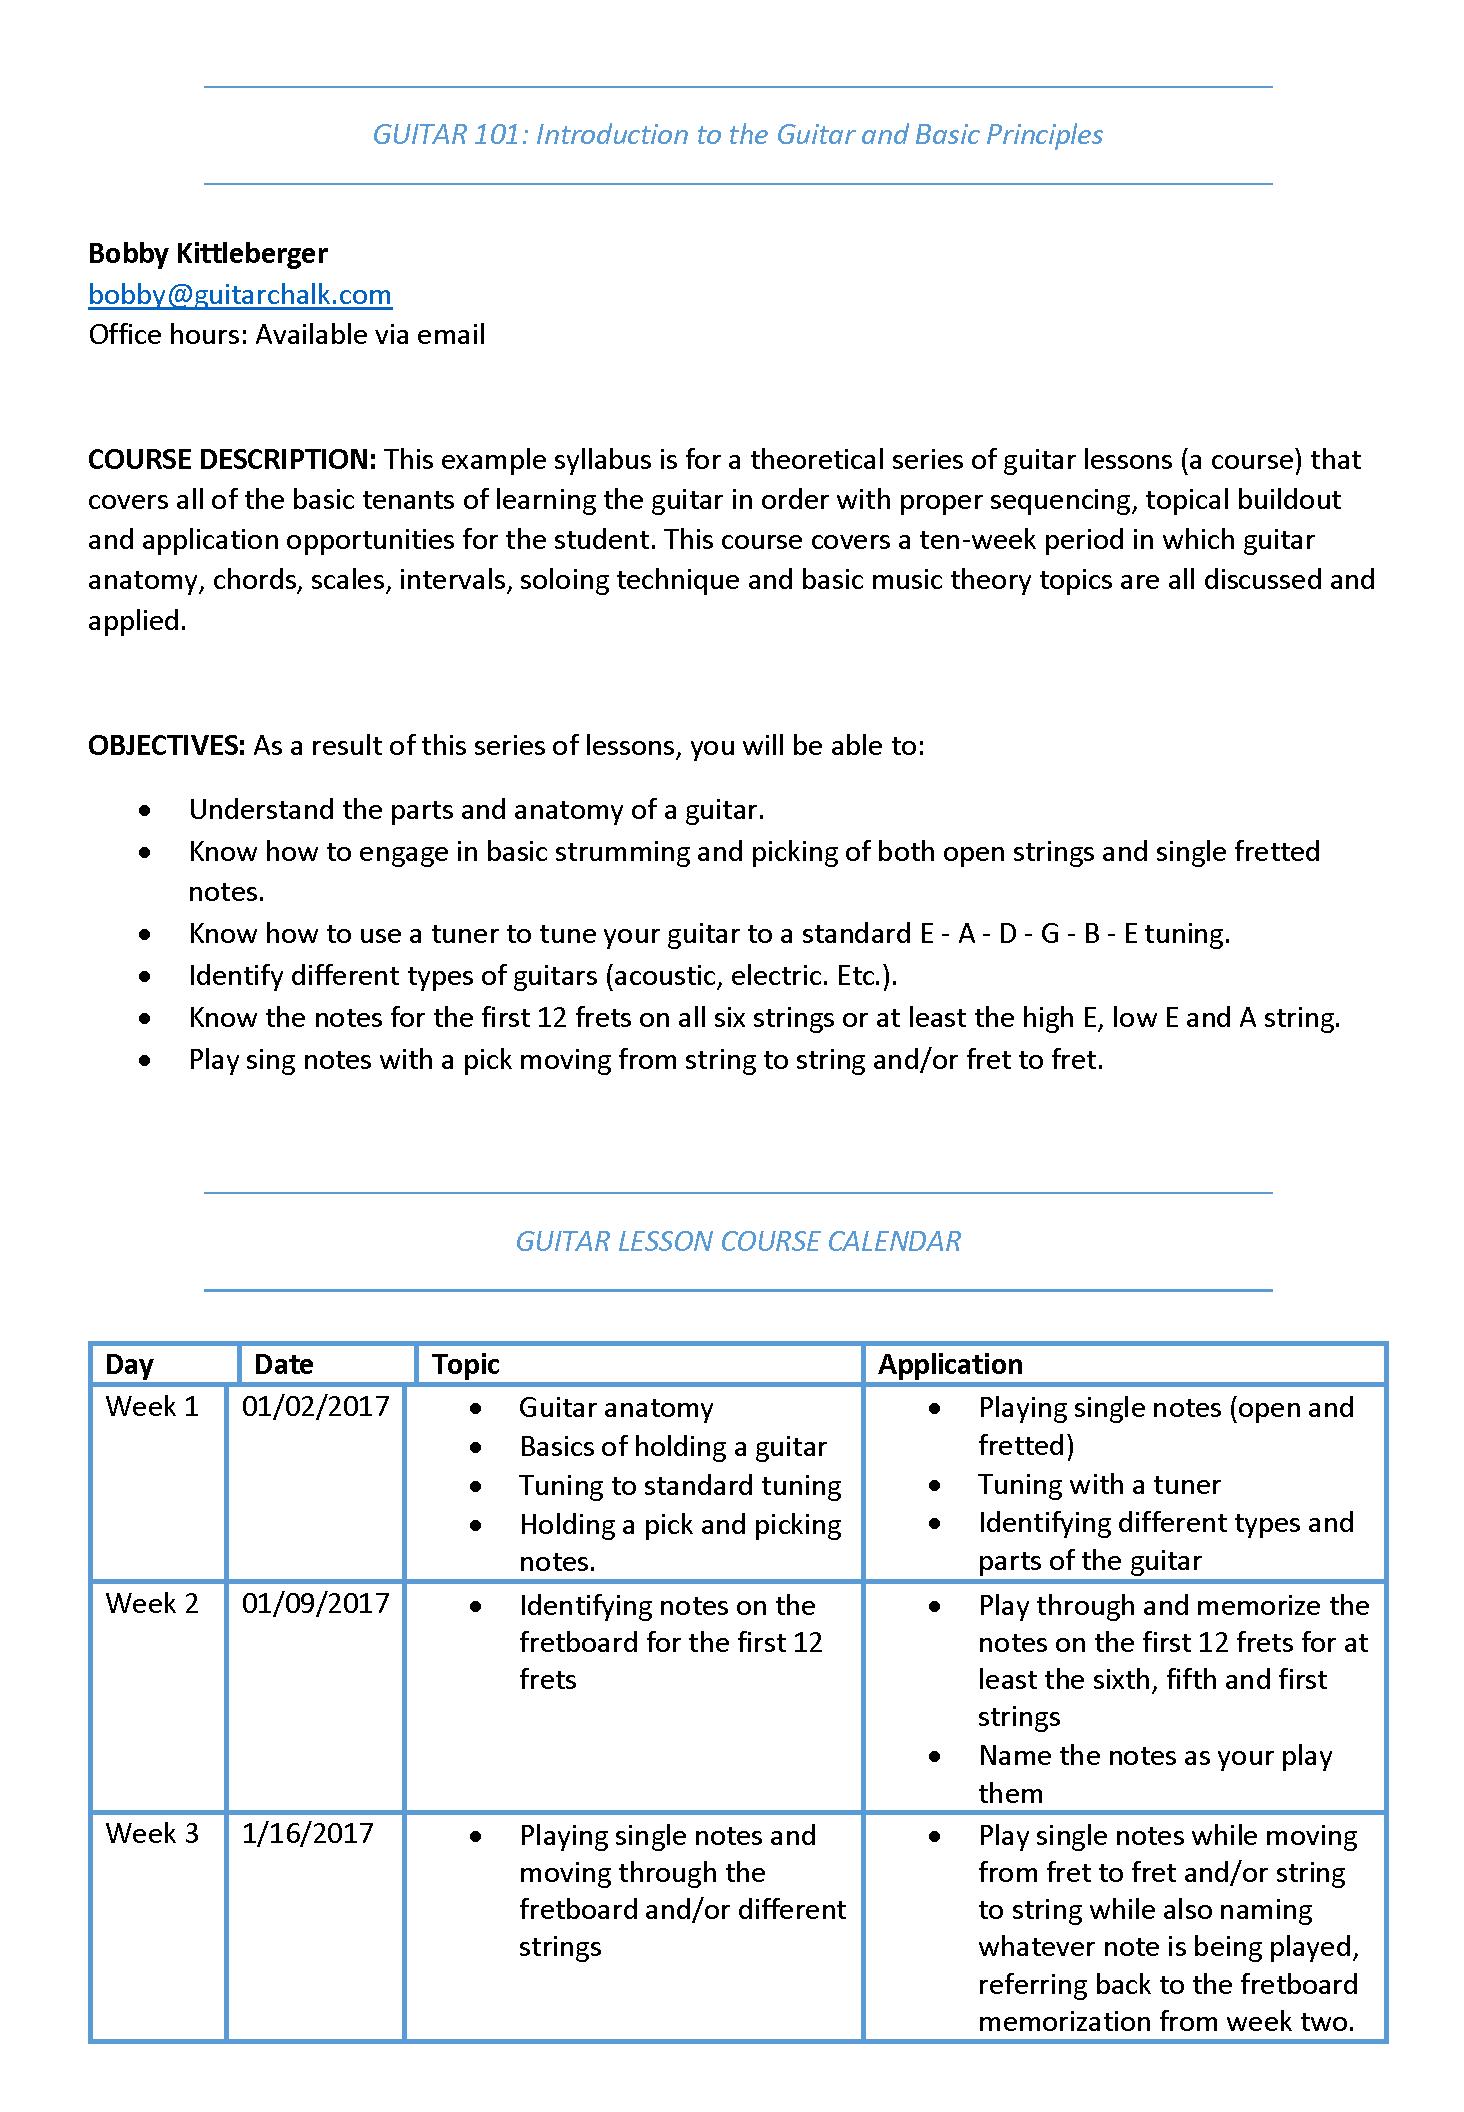 Syllabus Template Word